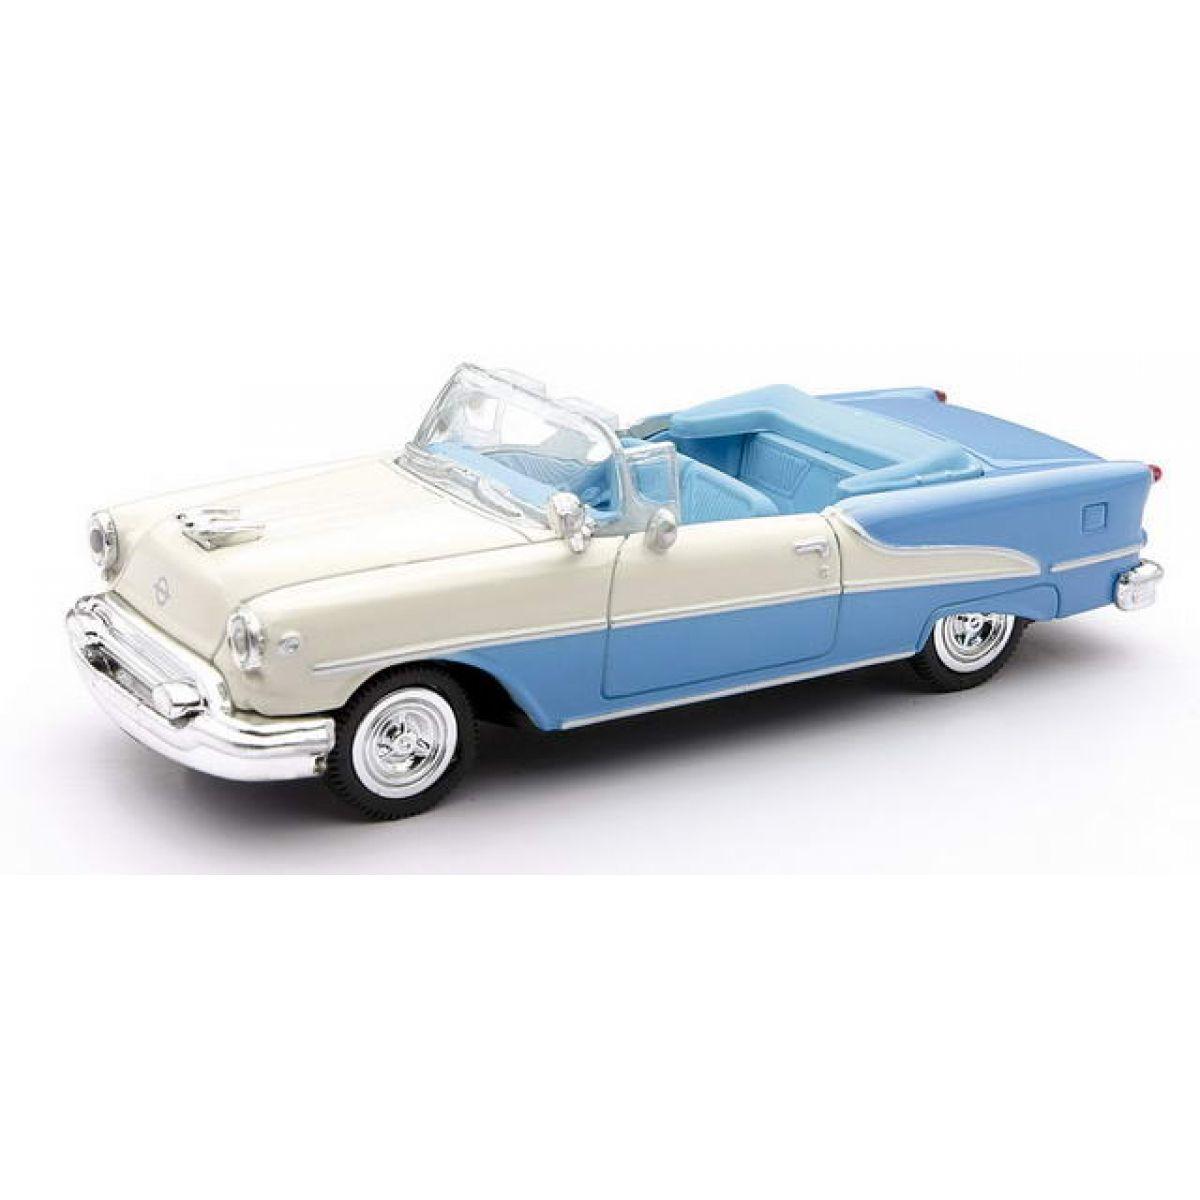 1:43 1955 Oldsmobile Super 88